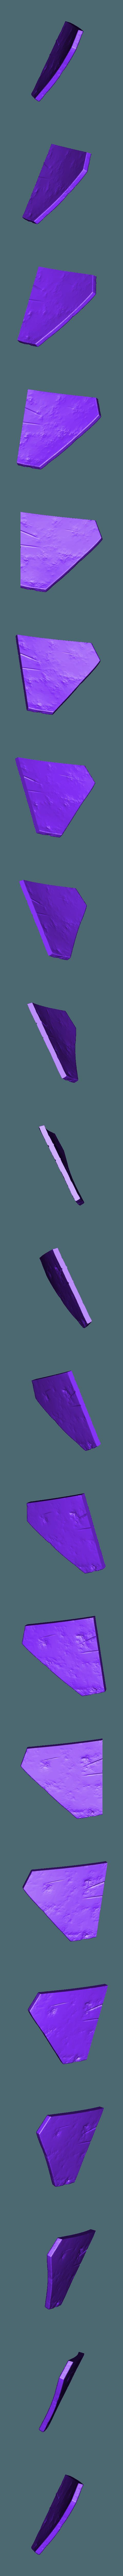 Armory_Damaged_Print25.obj Download OBJ file Armory - Knights of Ren Helmet (damaged), 3D print model • 3D print design, 3D-mon